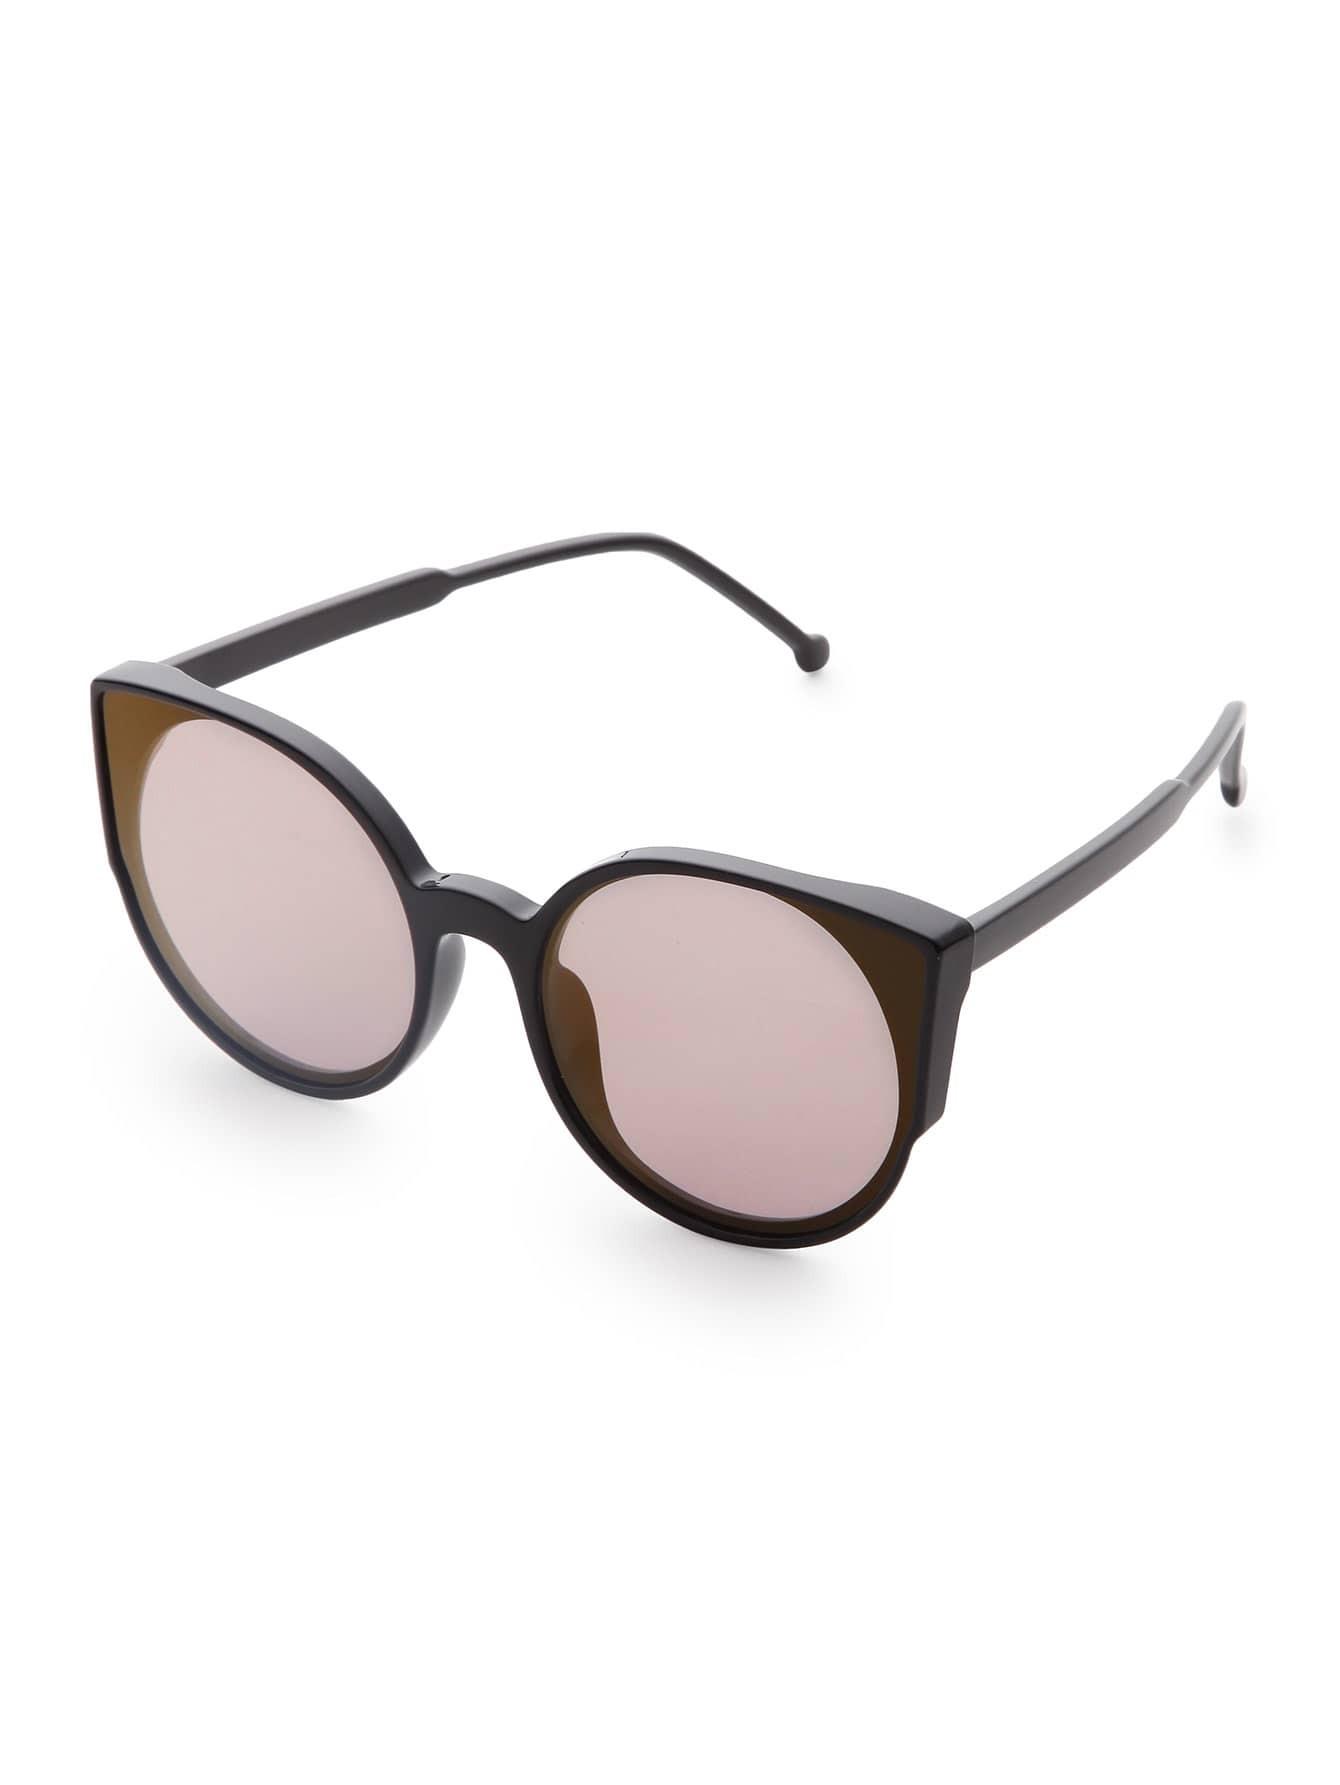 Black Frame Glasses With Gold : Black Frame Gold Lens Sunglasses -SheIn(Sheinside)